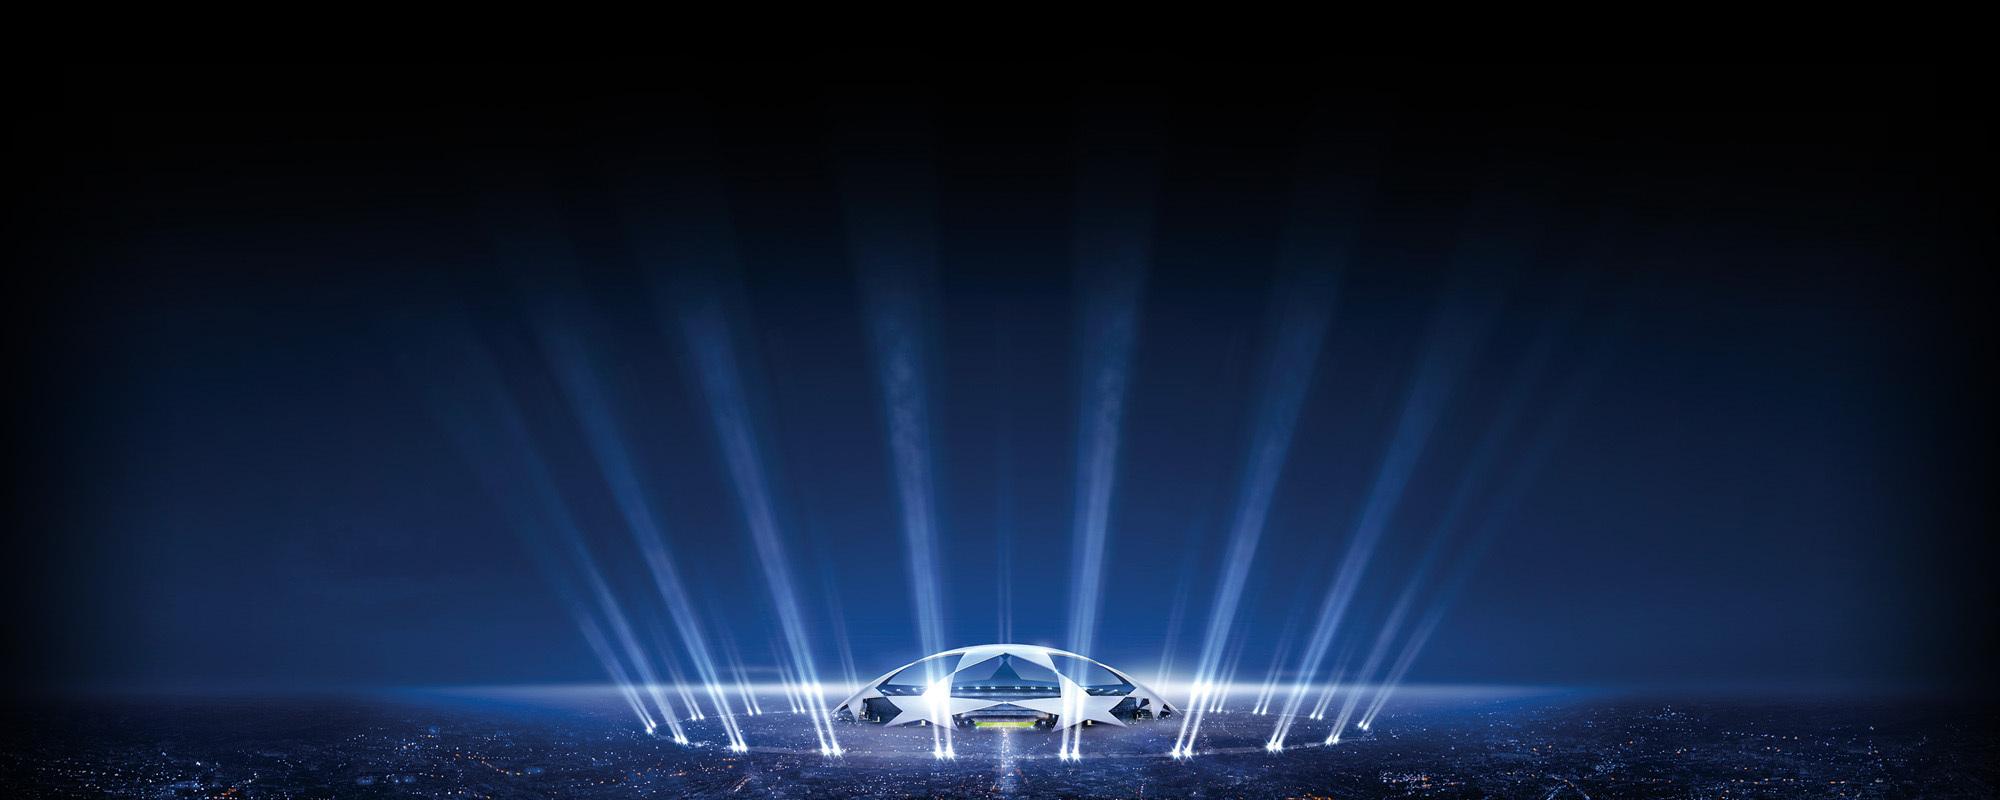 champions league - HD2000×800